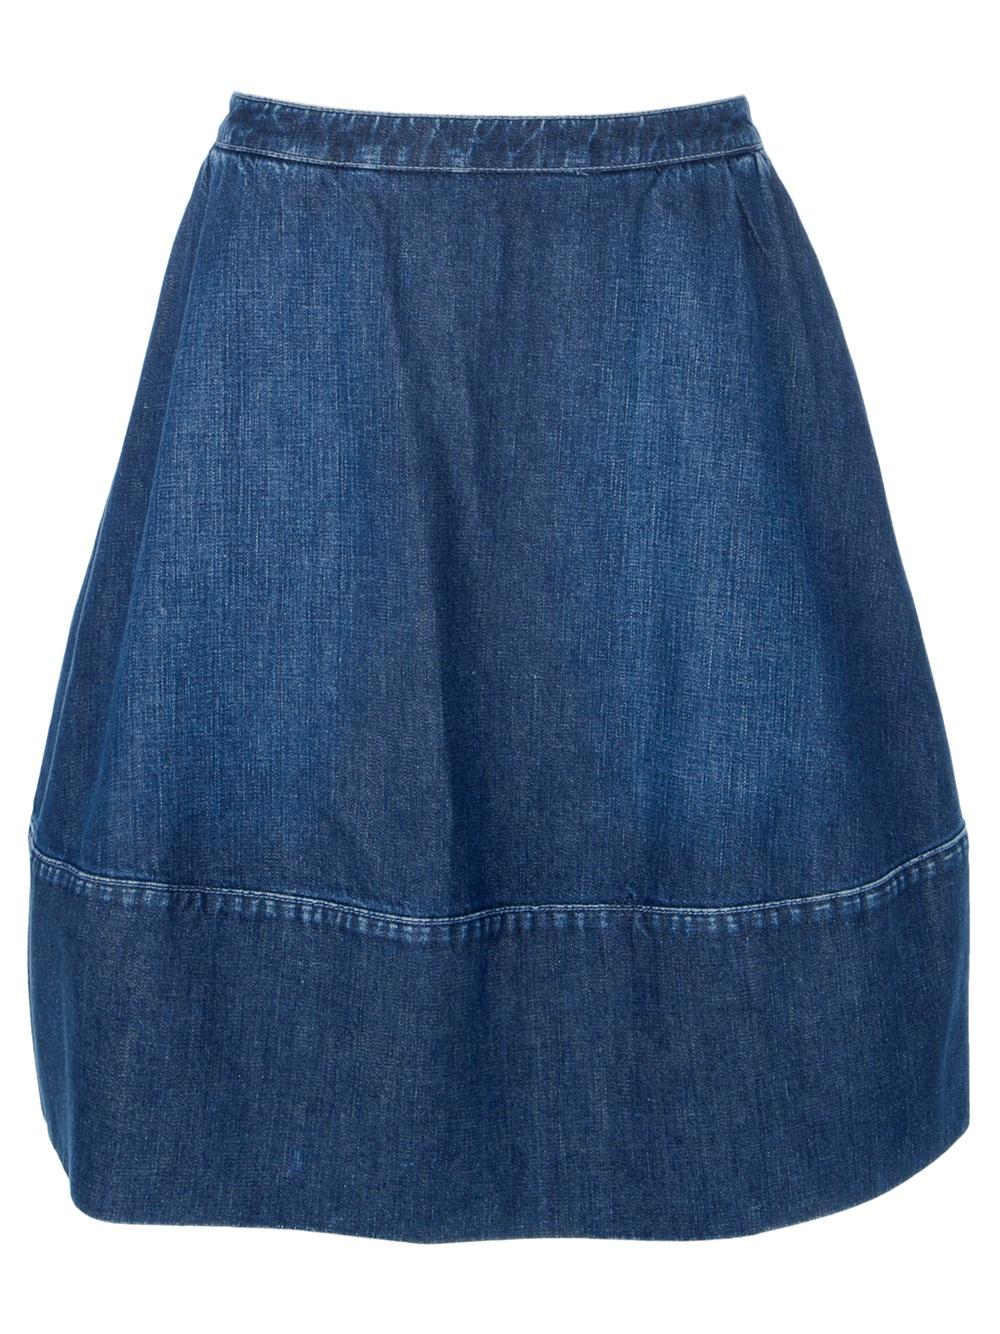 stella mccartney gonna denim skirt in blue lyst